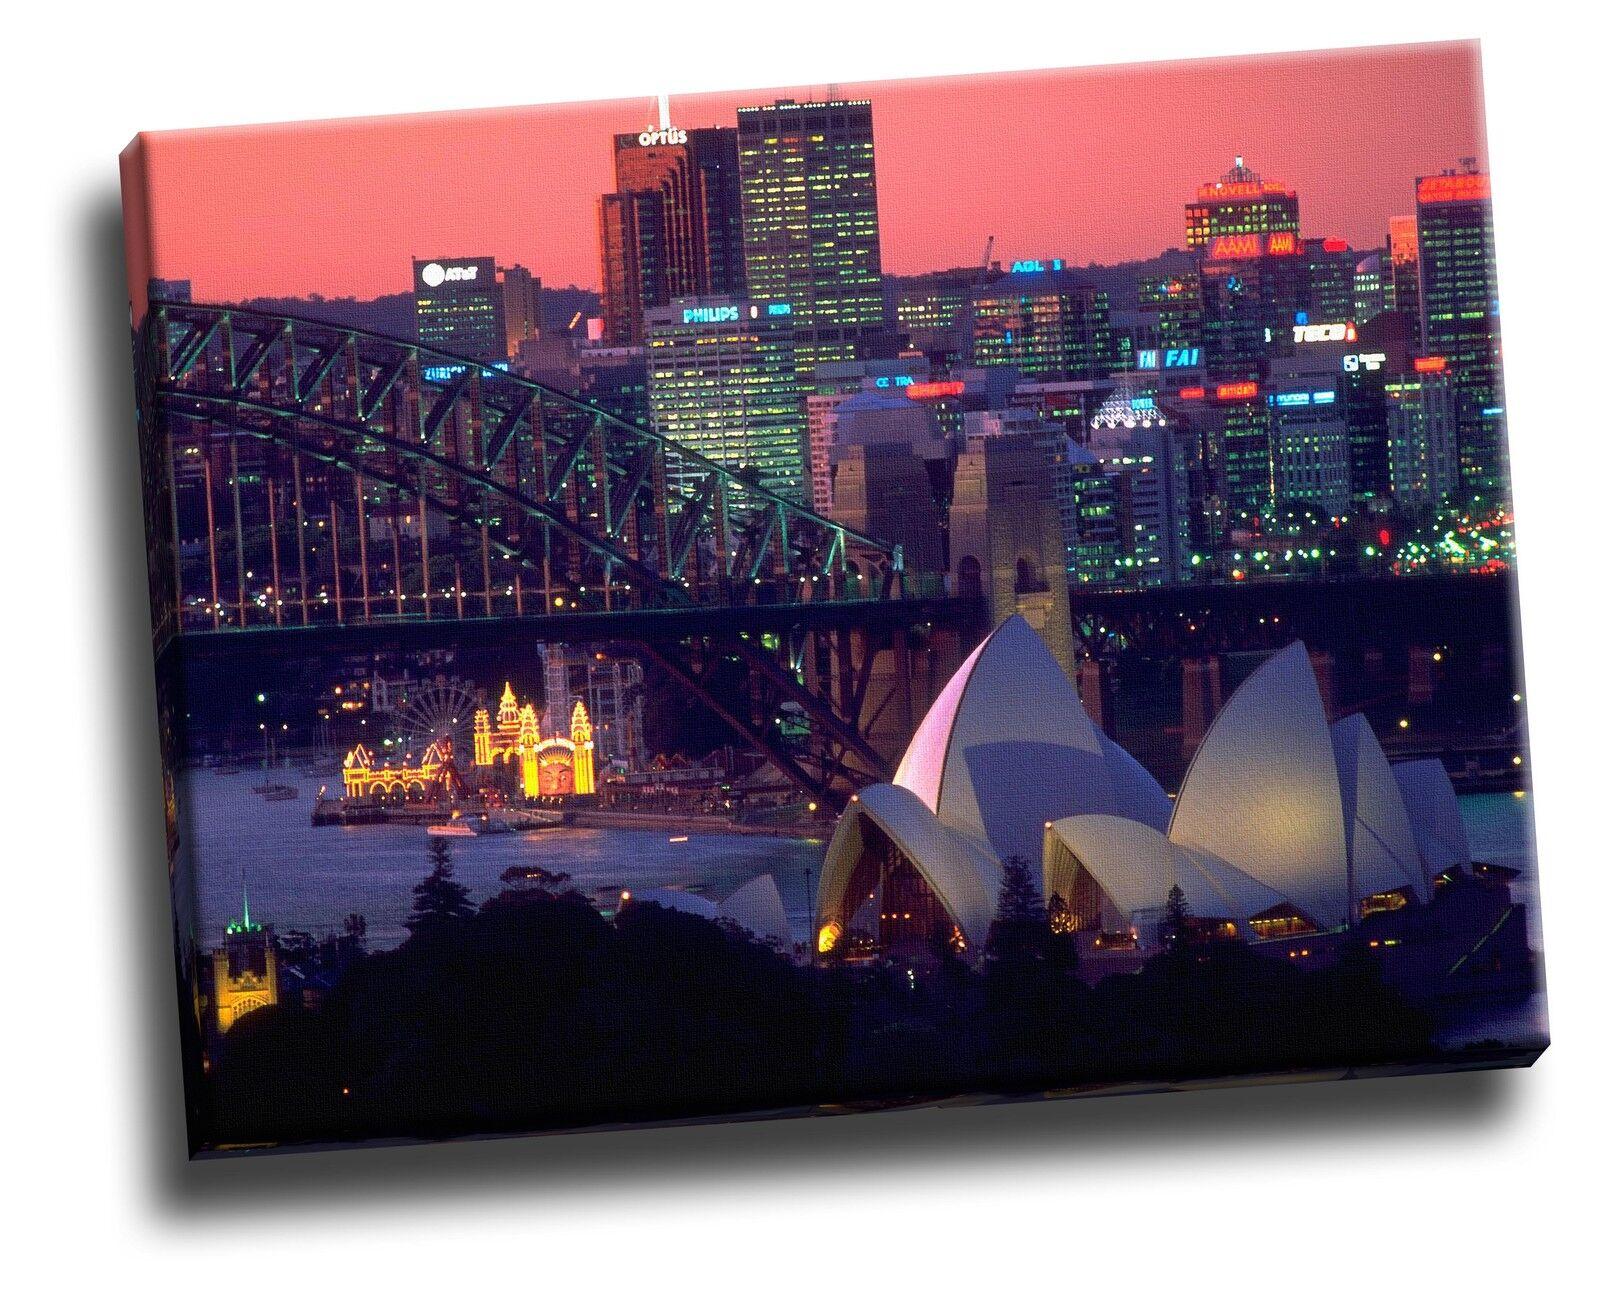 Skyline of Sydney, Australia Cityscape Giclee Canvas Picture Art